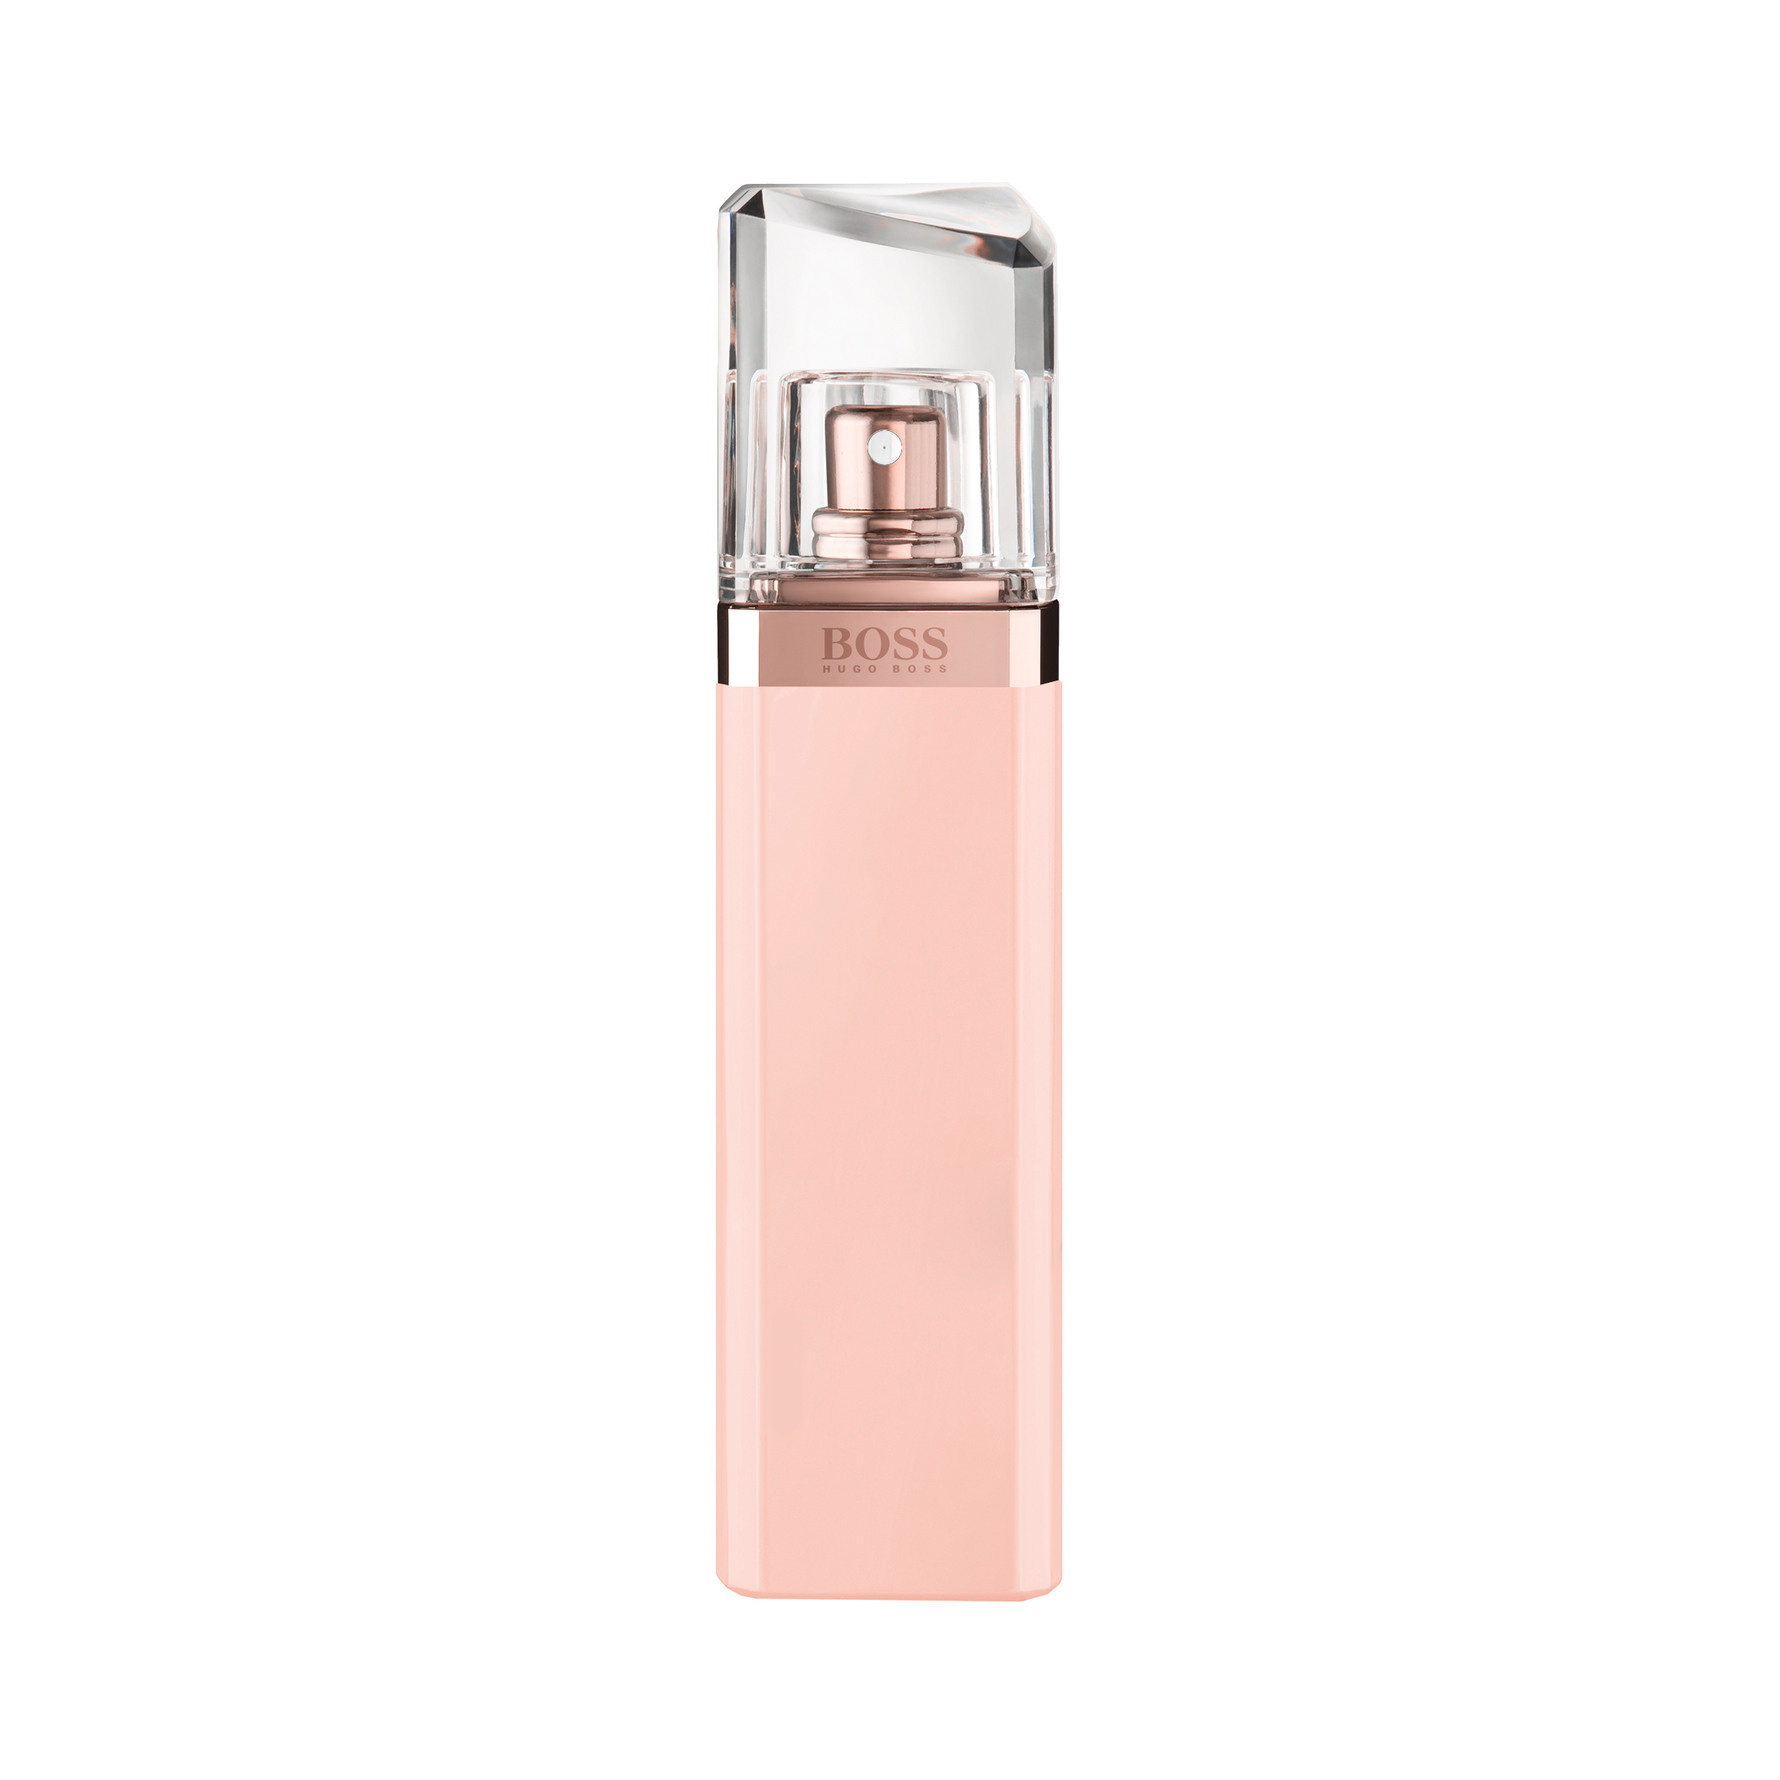 hugo boss parfume dame